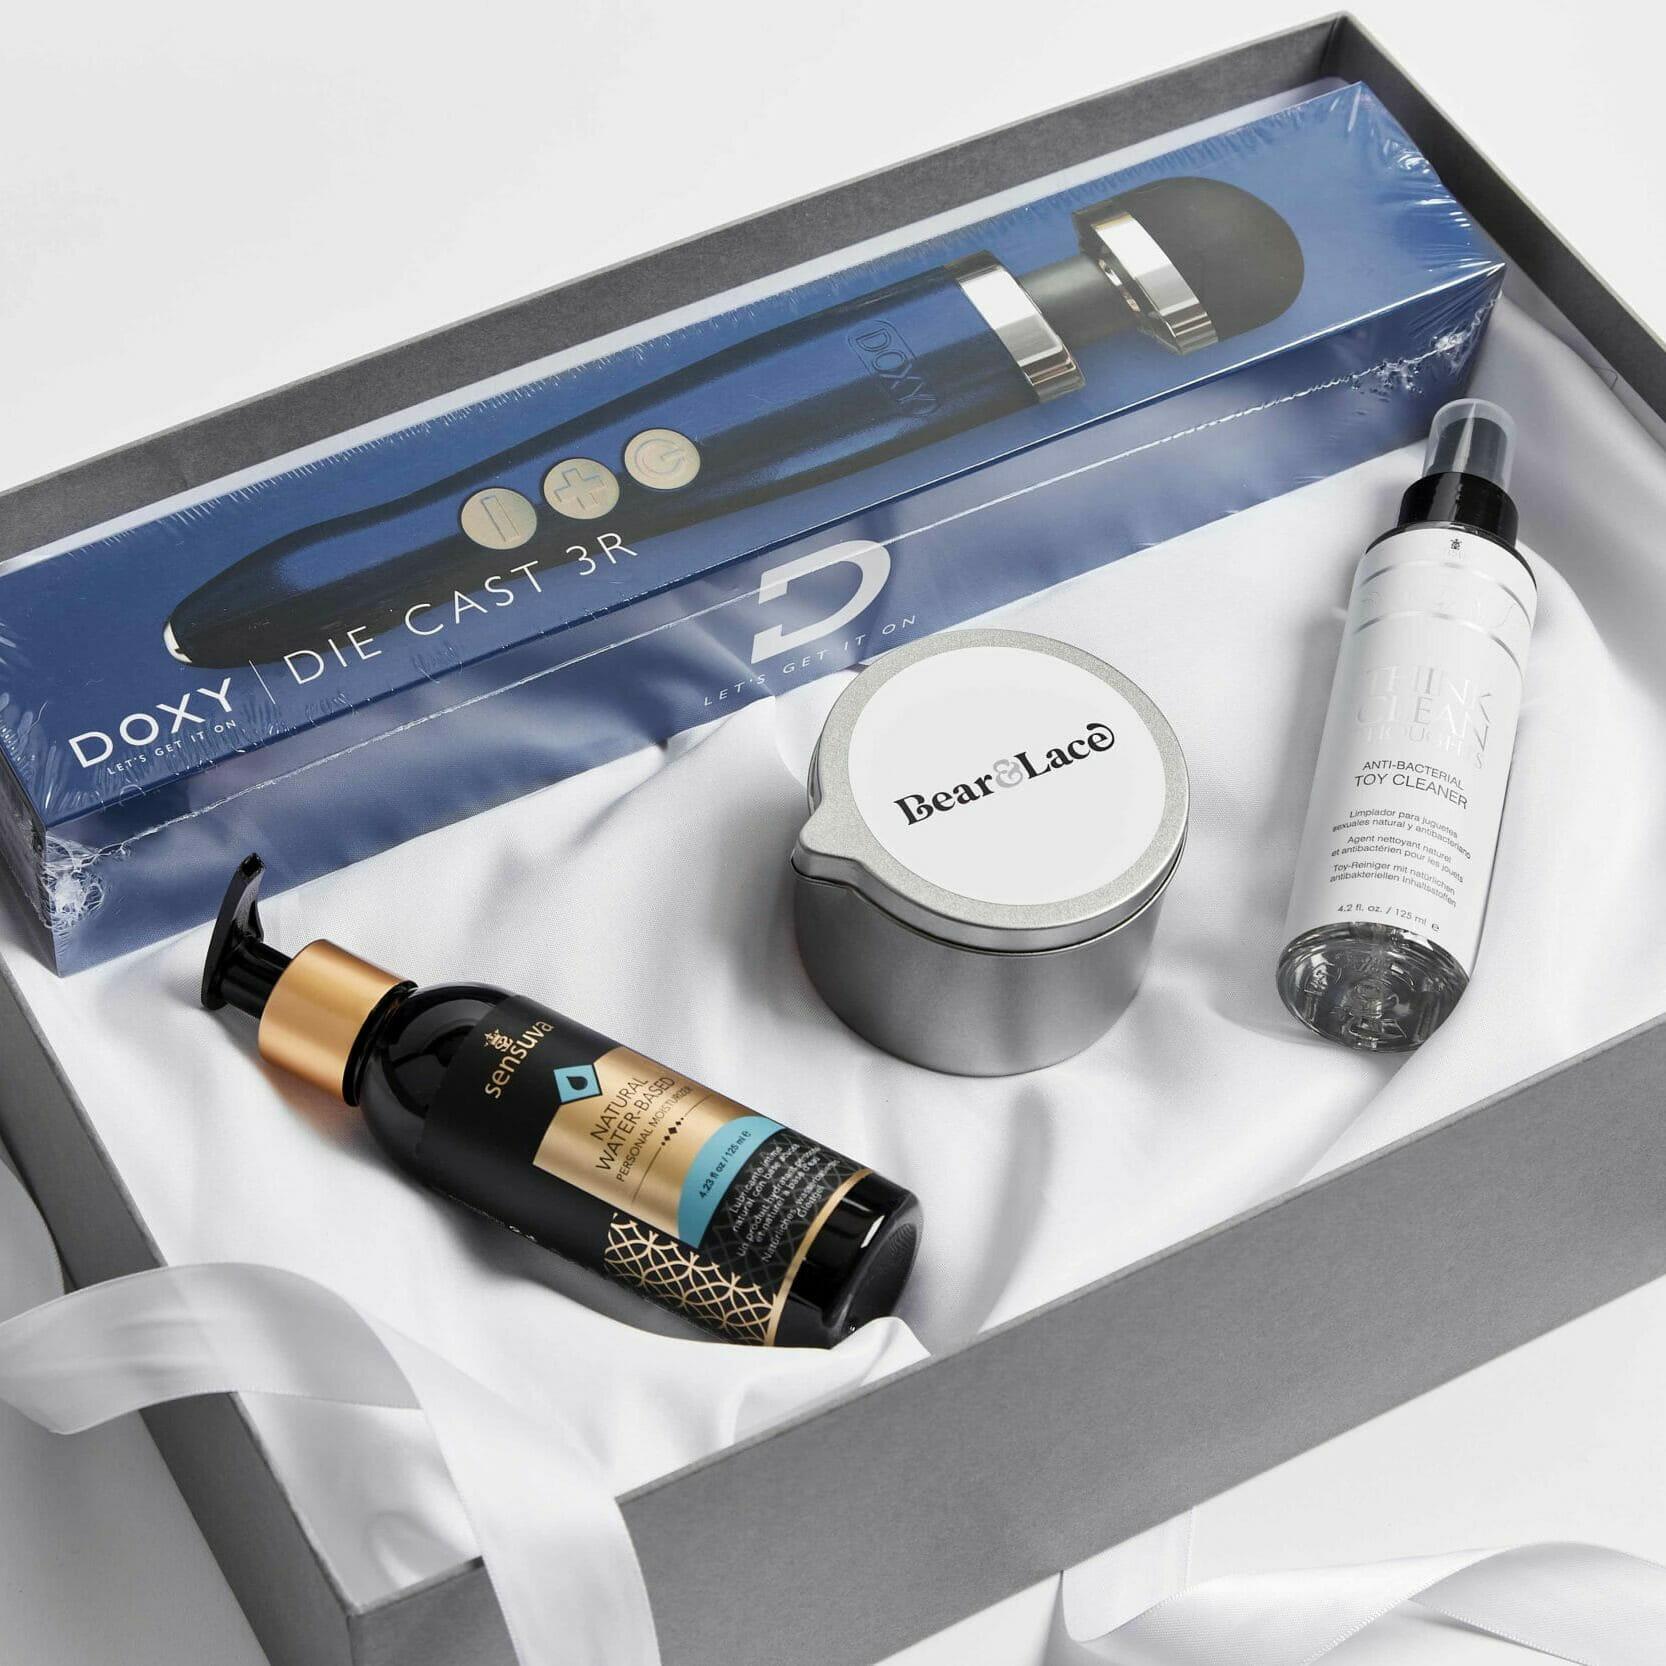 Bear & Lace Luxury Adult Gift Box